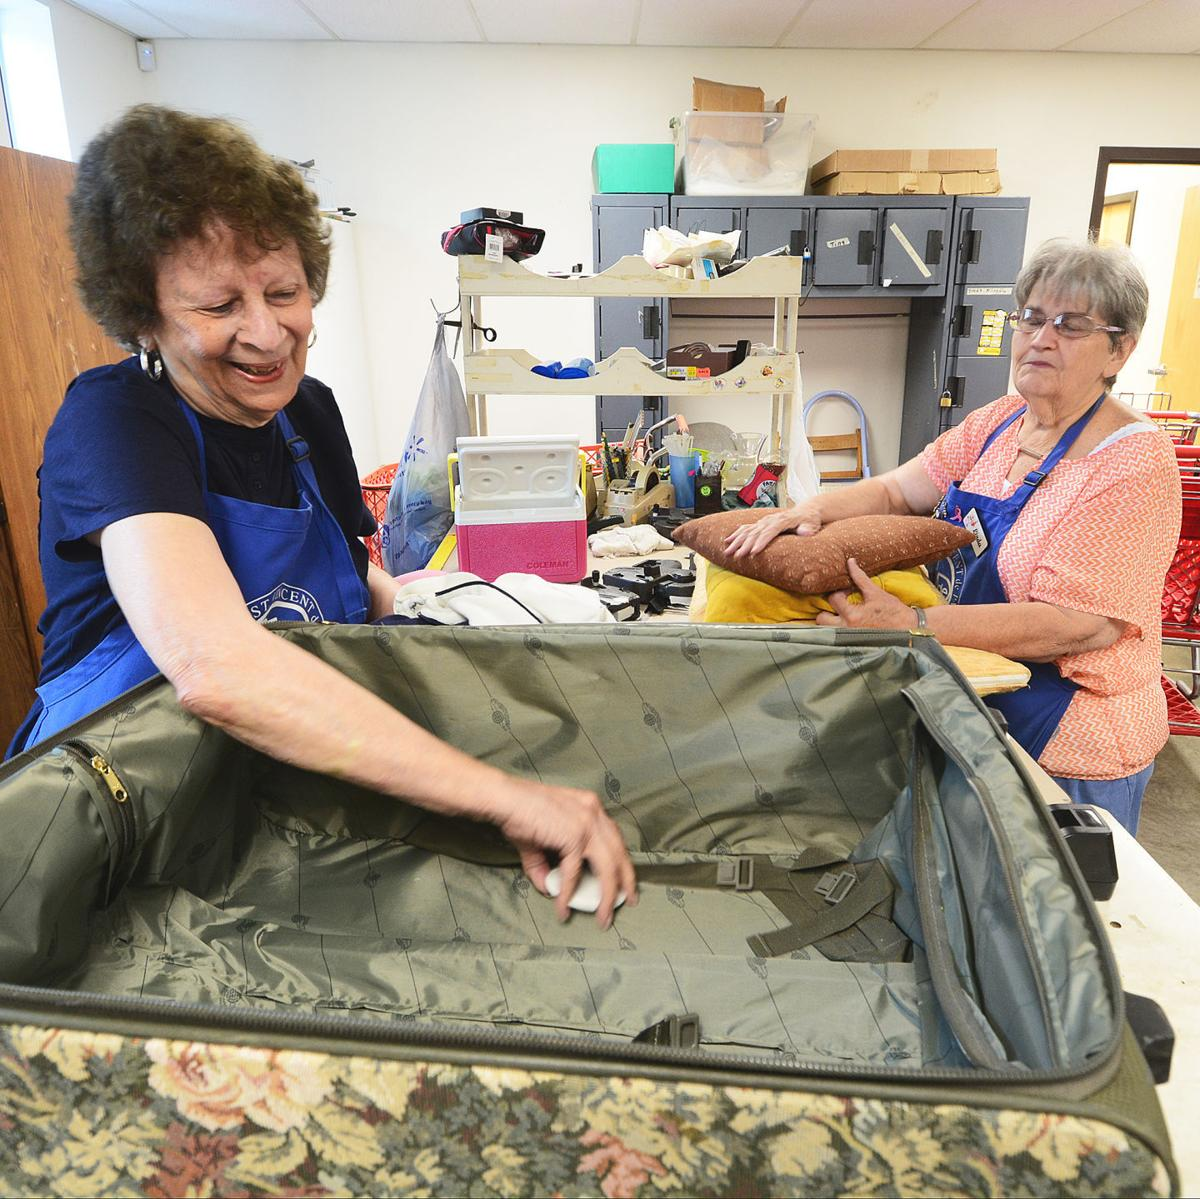 St. Vincent DePaul center reopens after fire